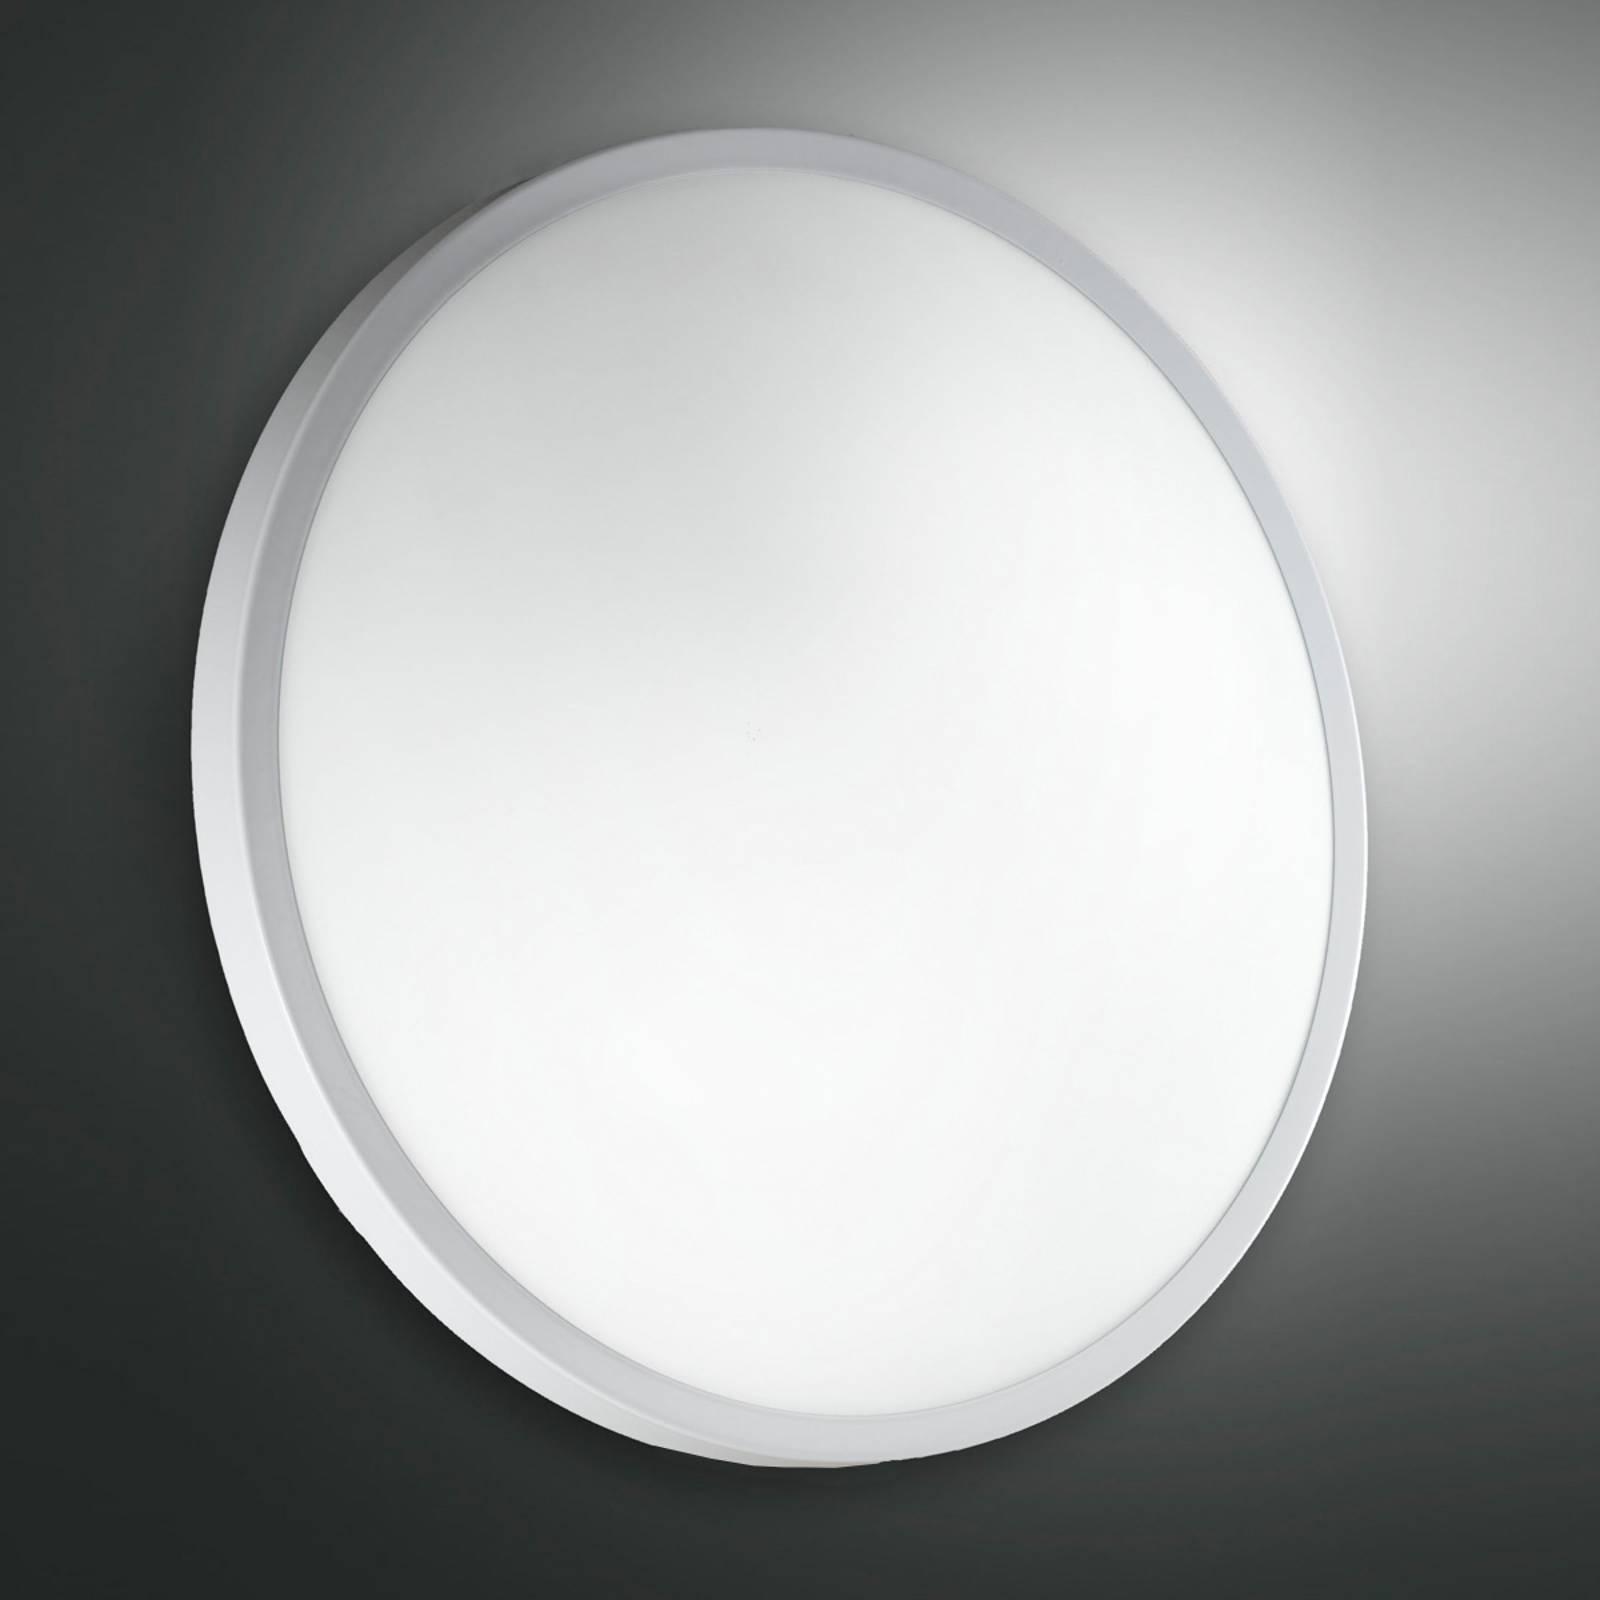 Plafond- en wandlamp PLAZA, glas 41 cm ws